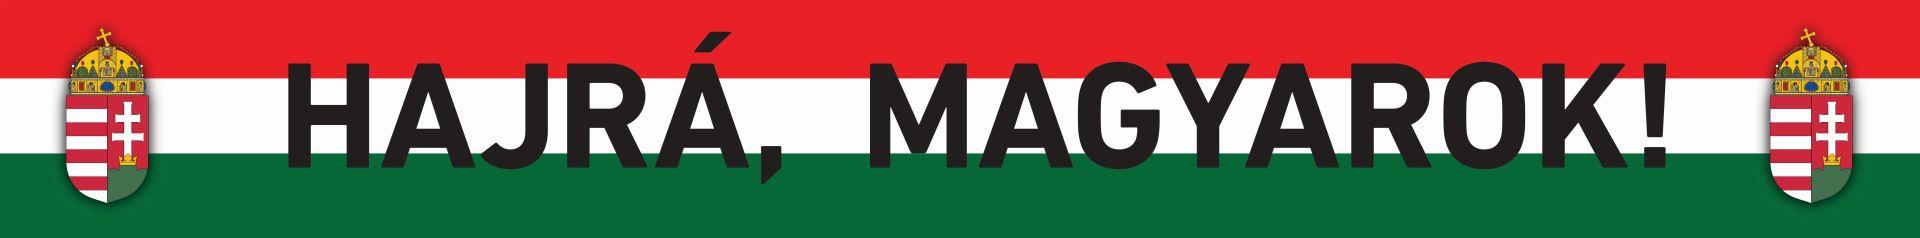 Hajrá magyarok sál